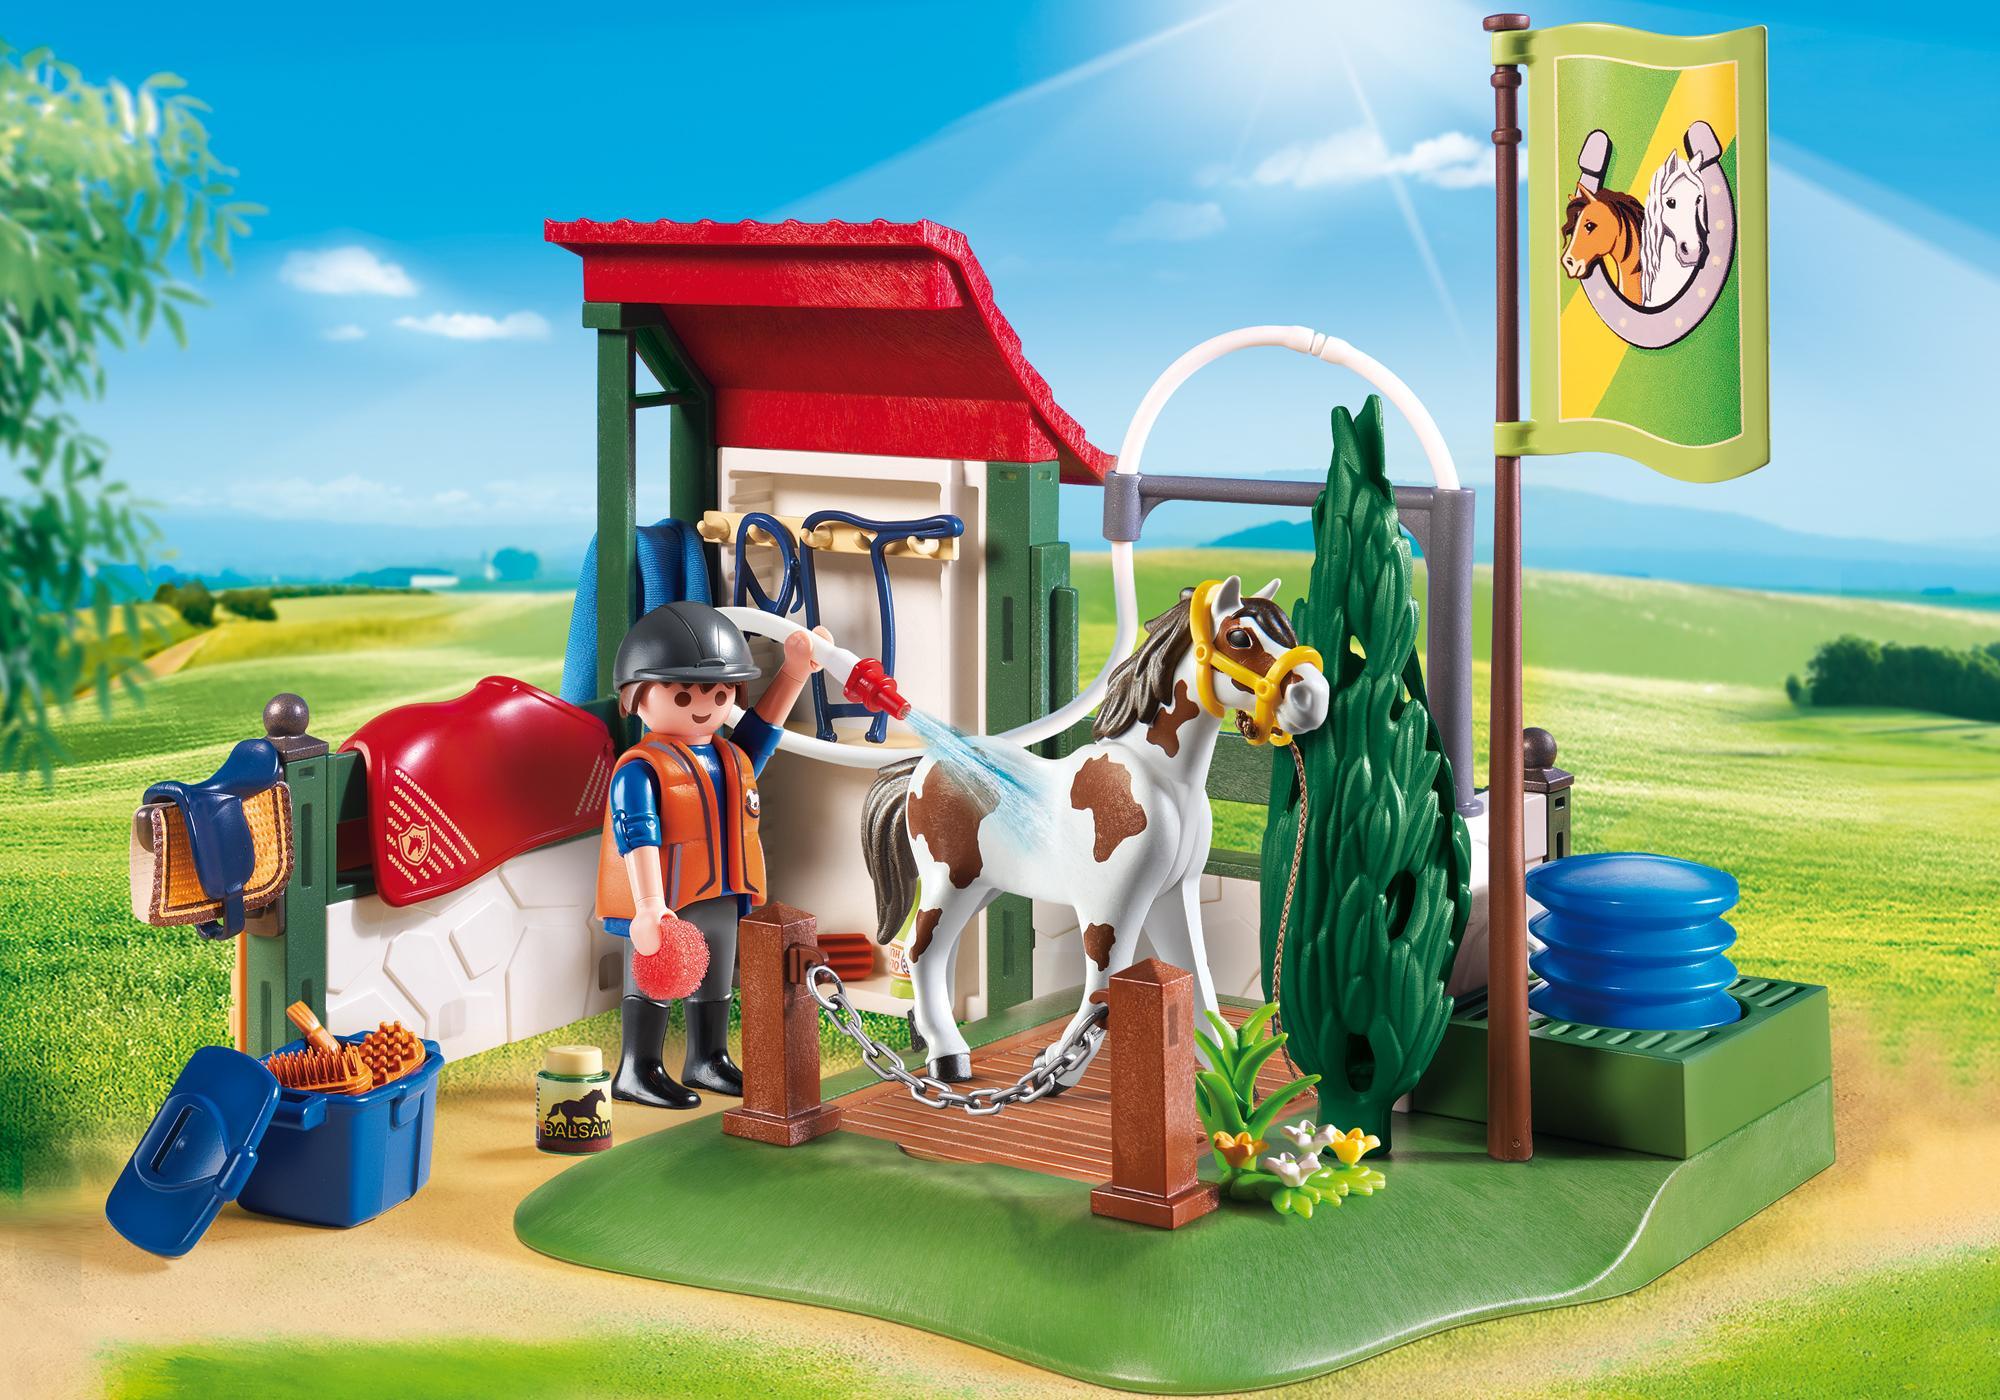 http://media.playmobil.com/i/playmobil/6929_product_detail/Set de Limpieza para Caballos